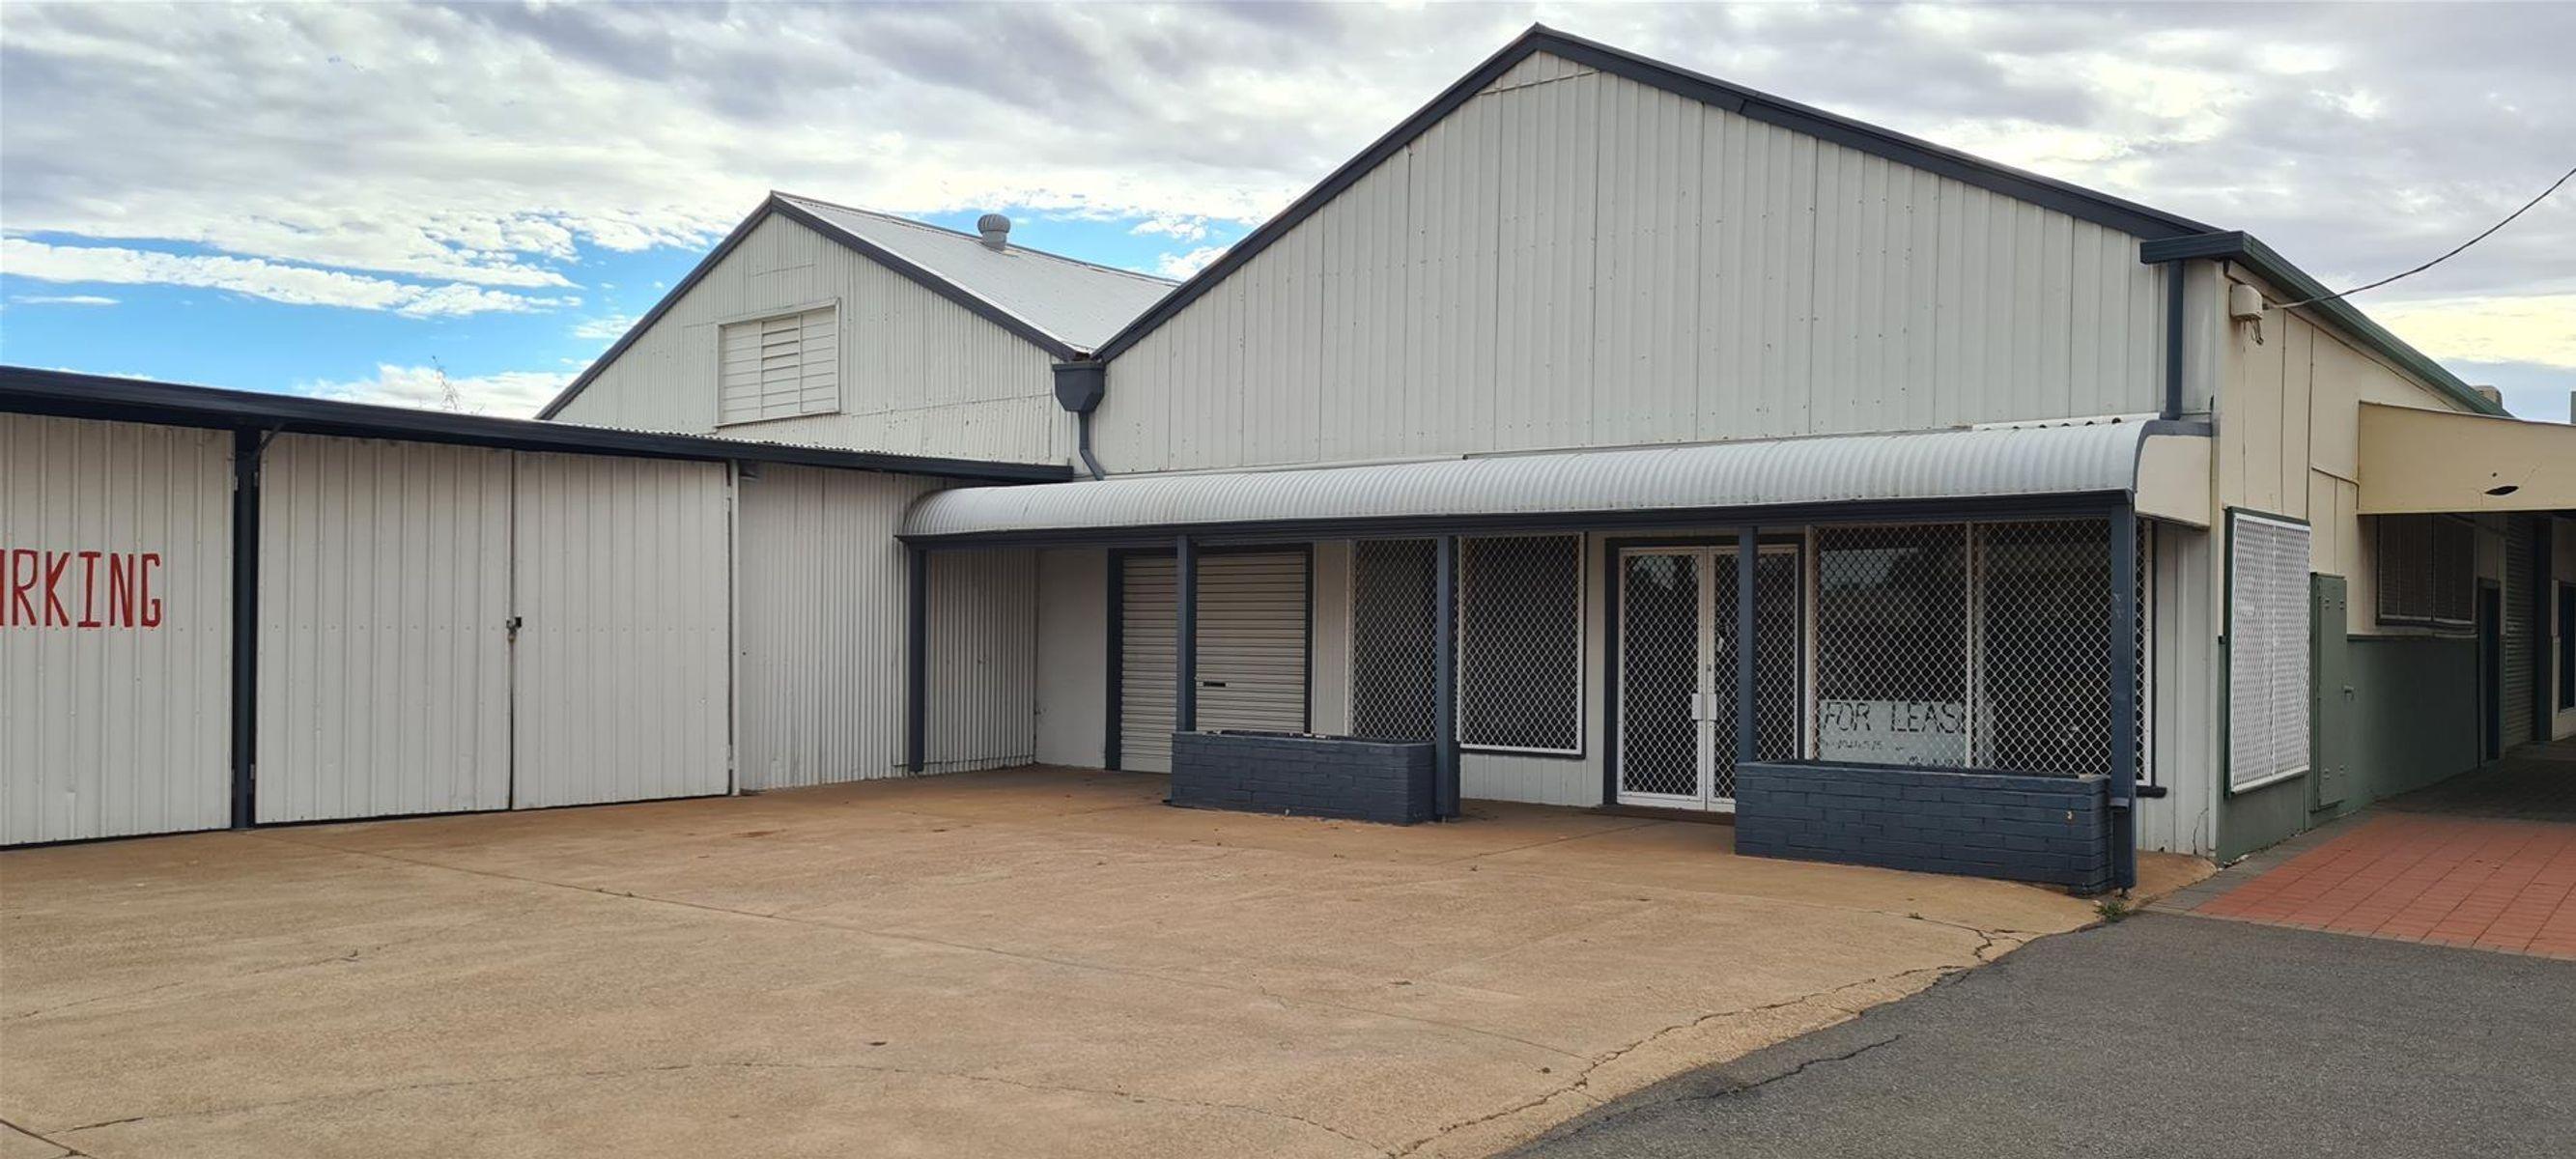 188 Egan Street, Kalgoorlie, WA 6430